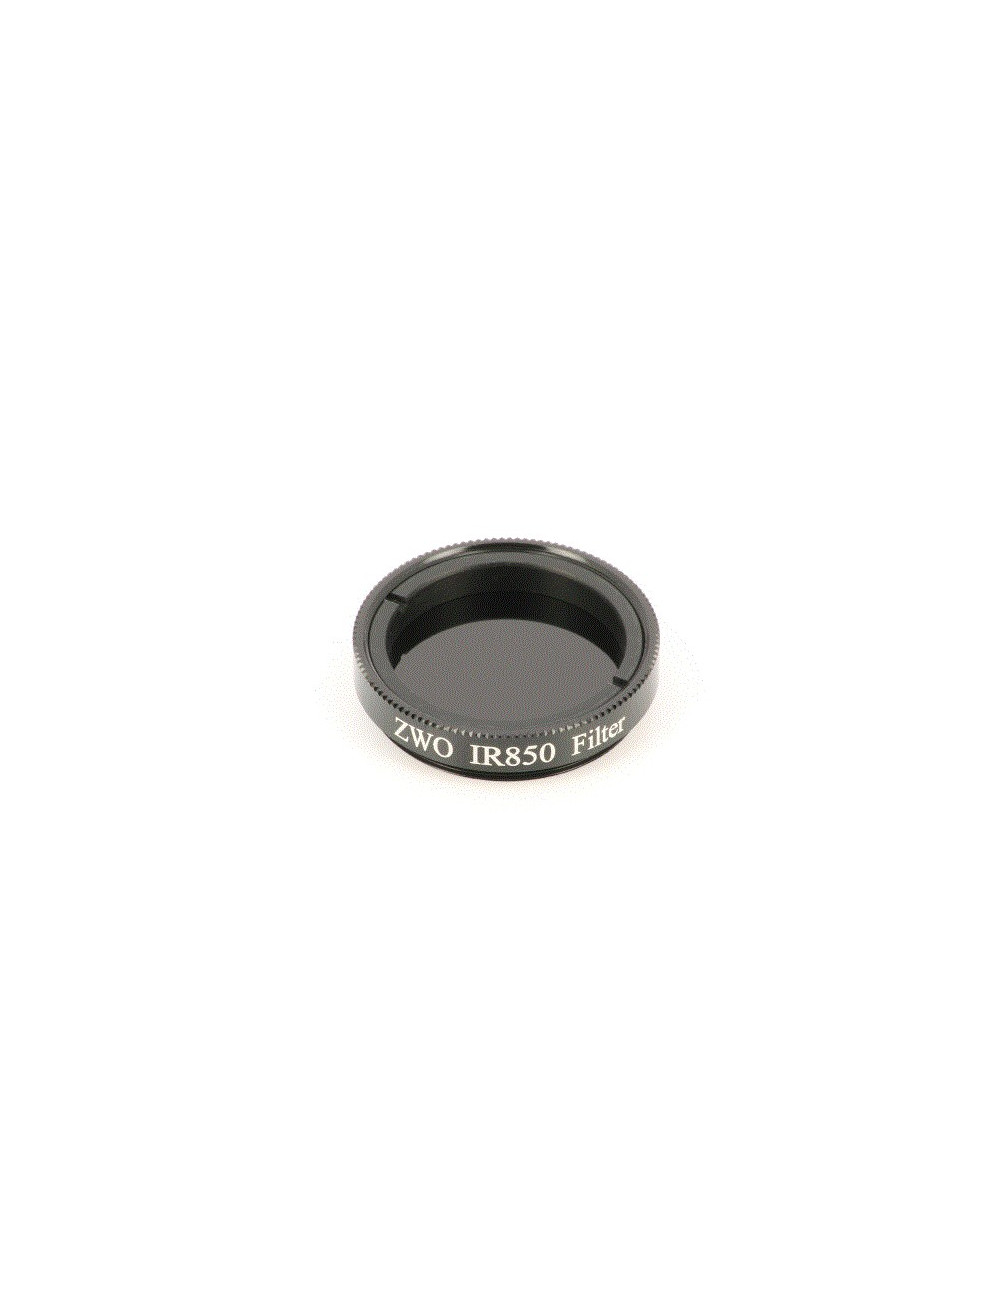 Filtre IR Pass 850nm ZWO au coulant 31.75mm